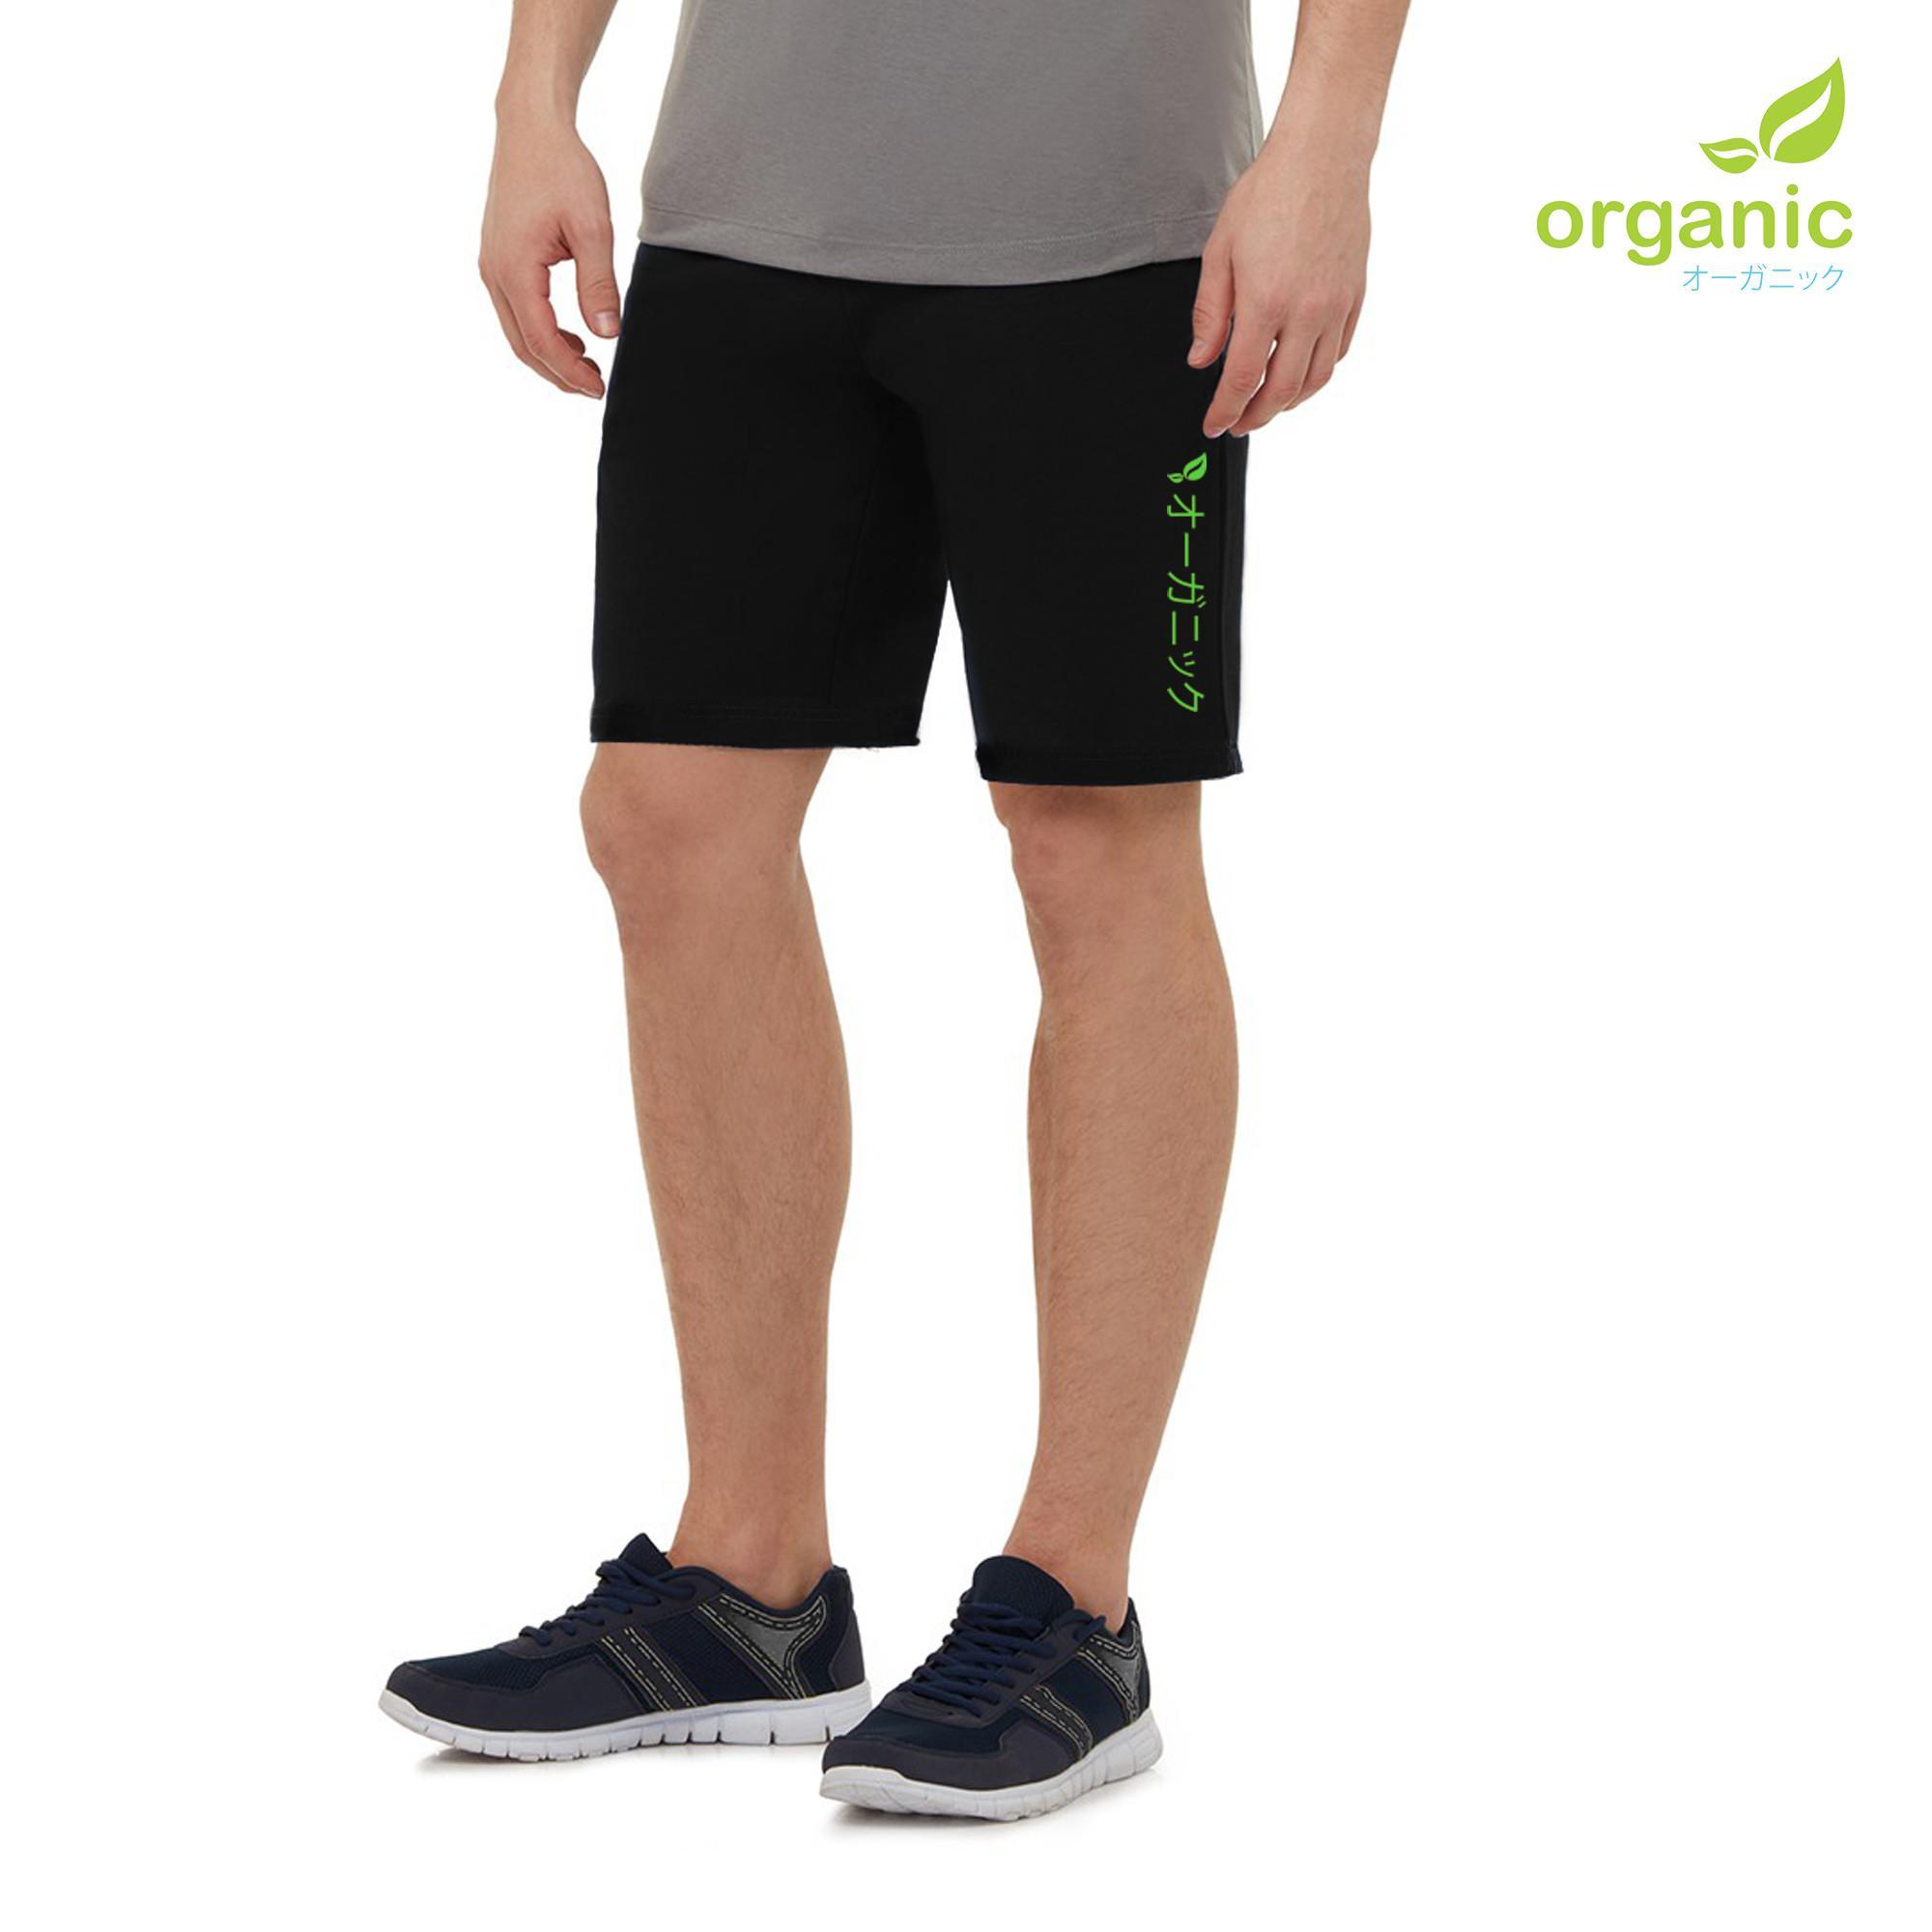 Organic Mens Short Black Sweat Jogger Training Gym Running Shorts For Men